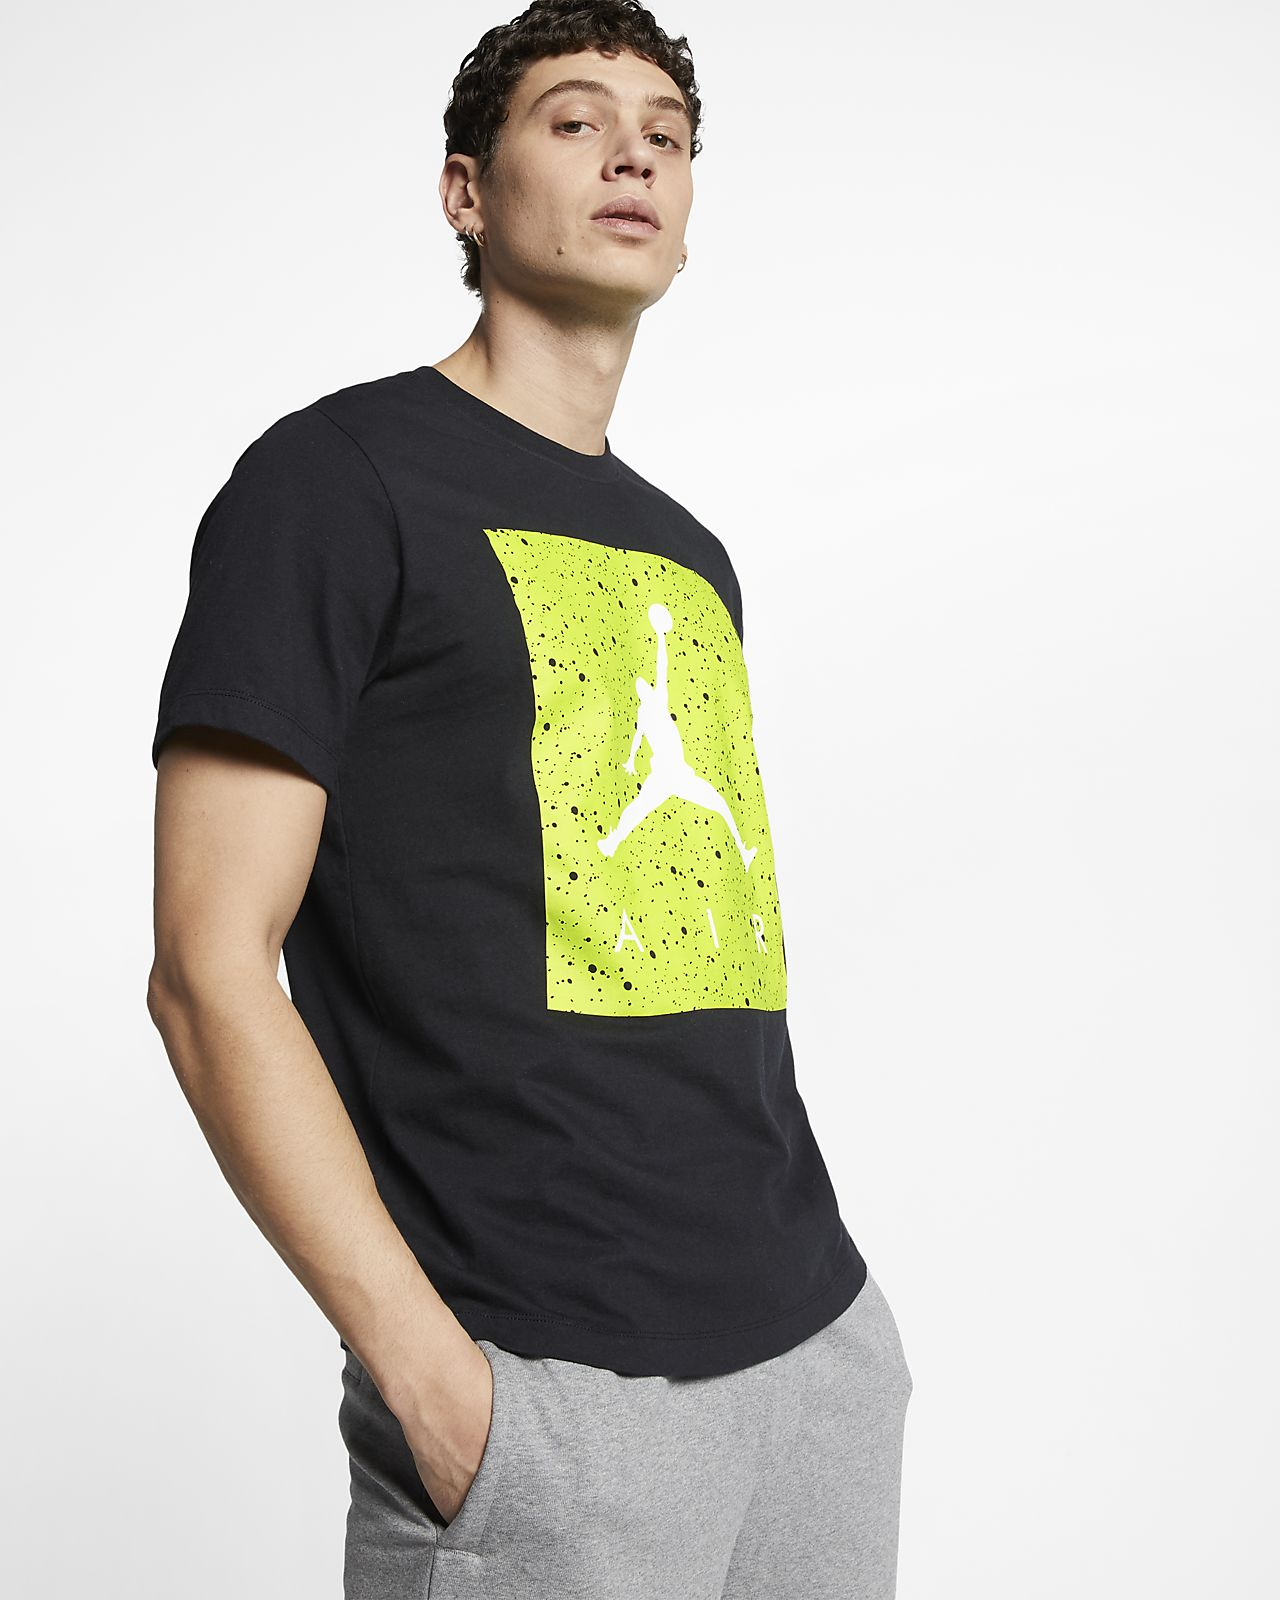 c7bc9773b08d5b Jordan Poolside Men's T-Shirt. Nike.com